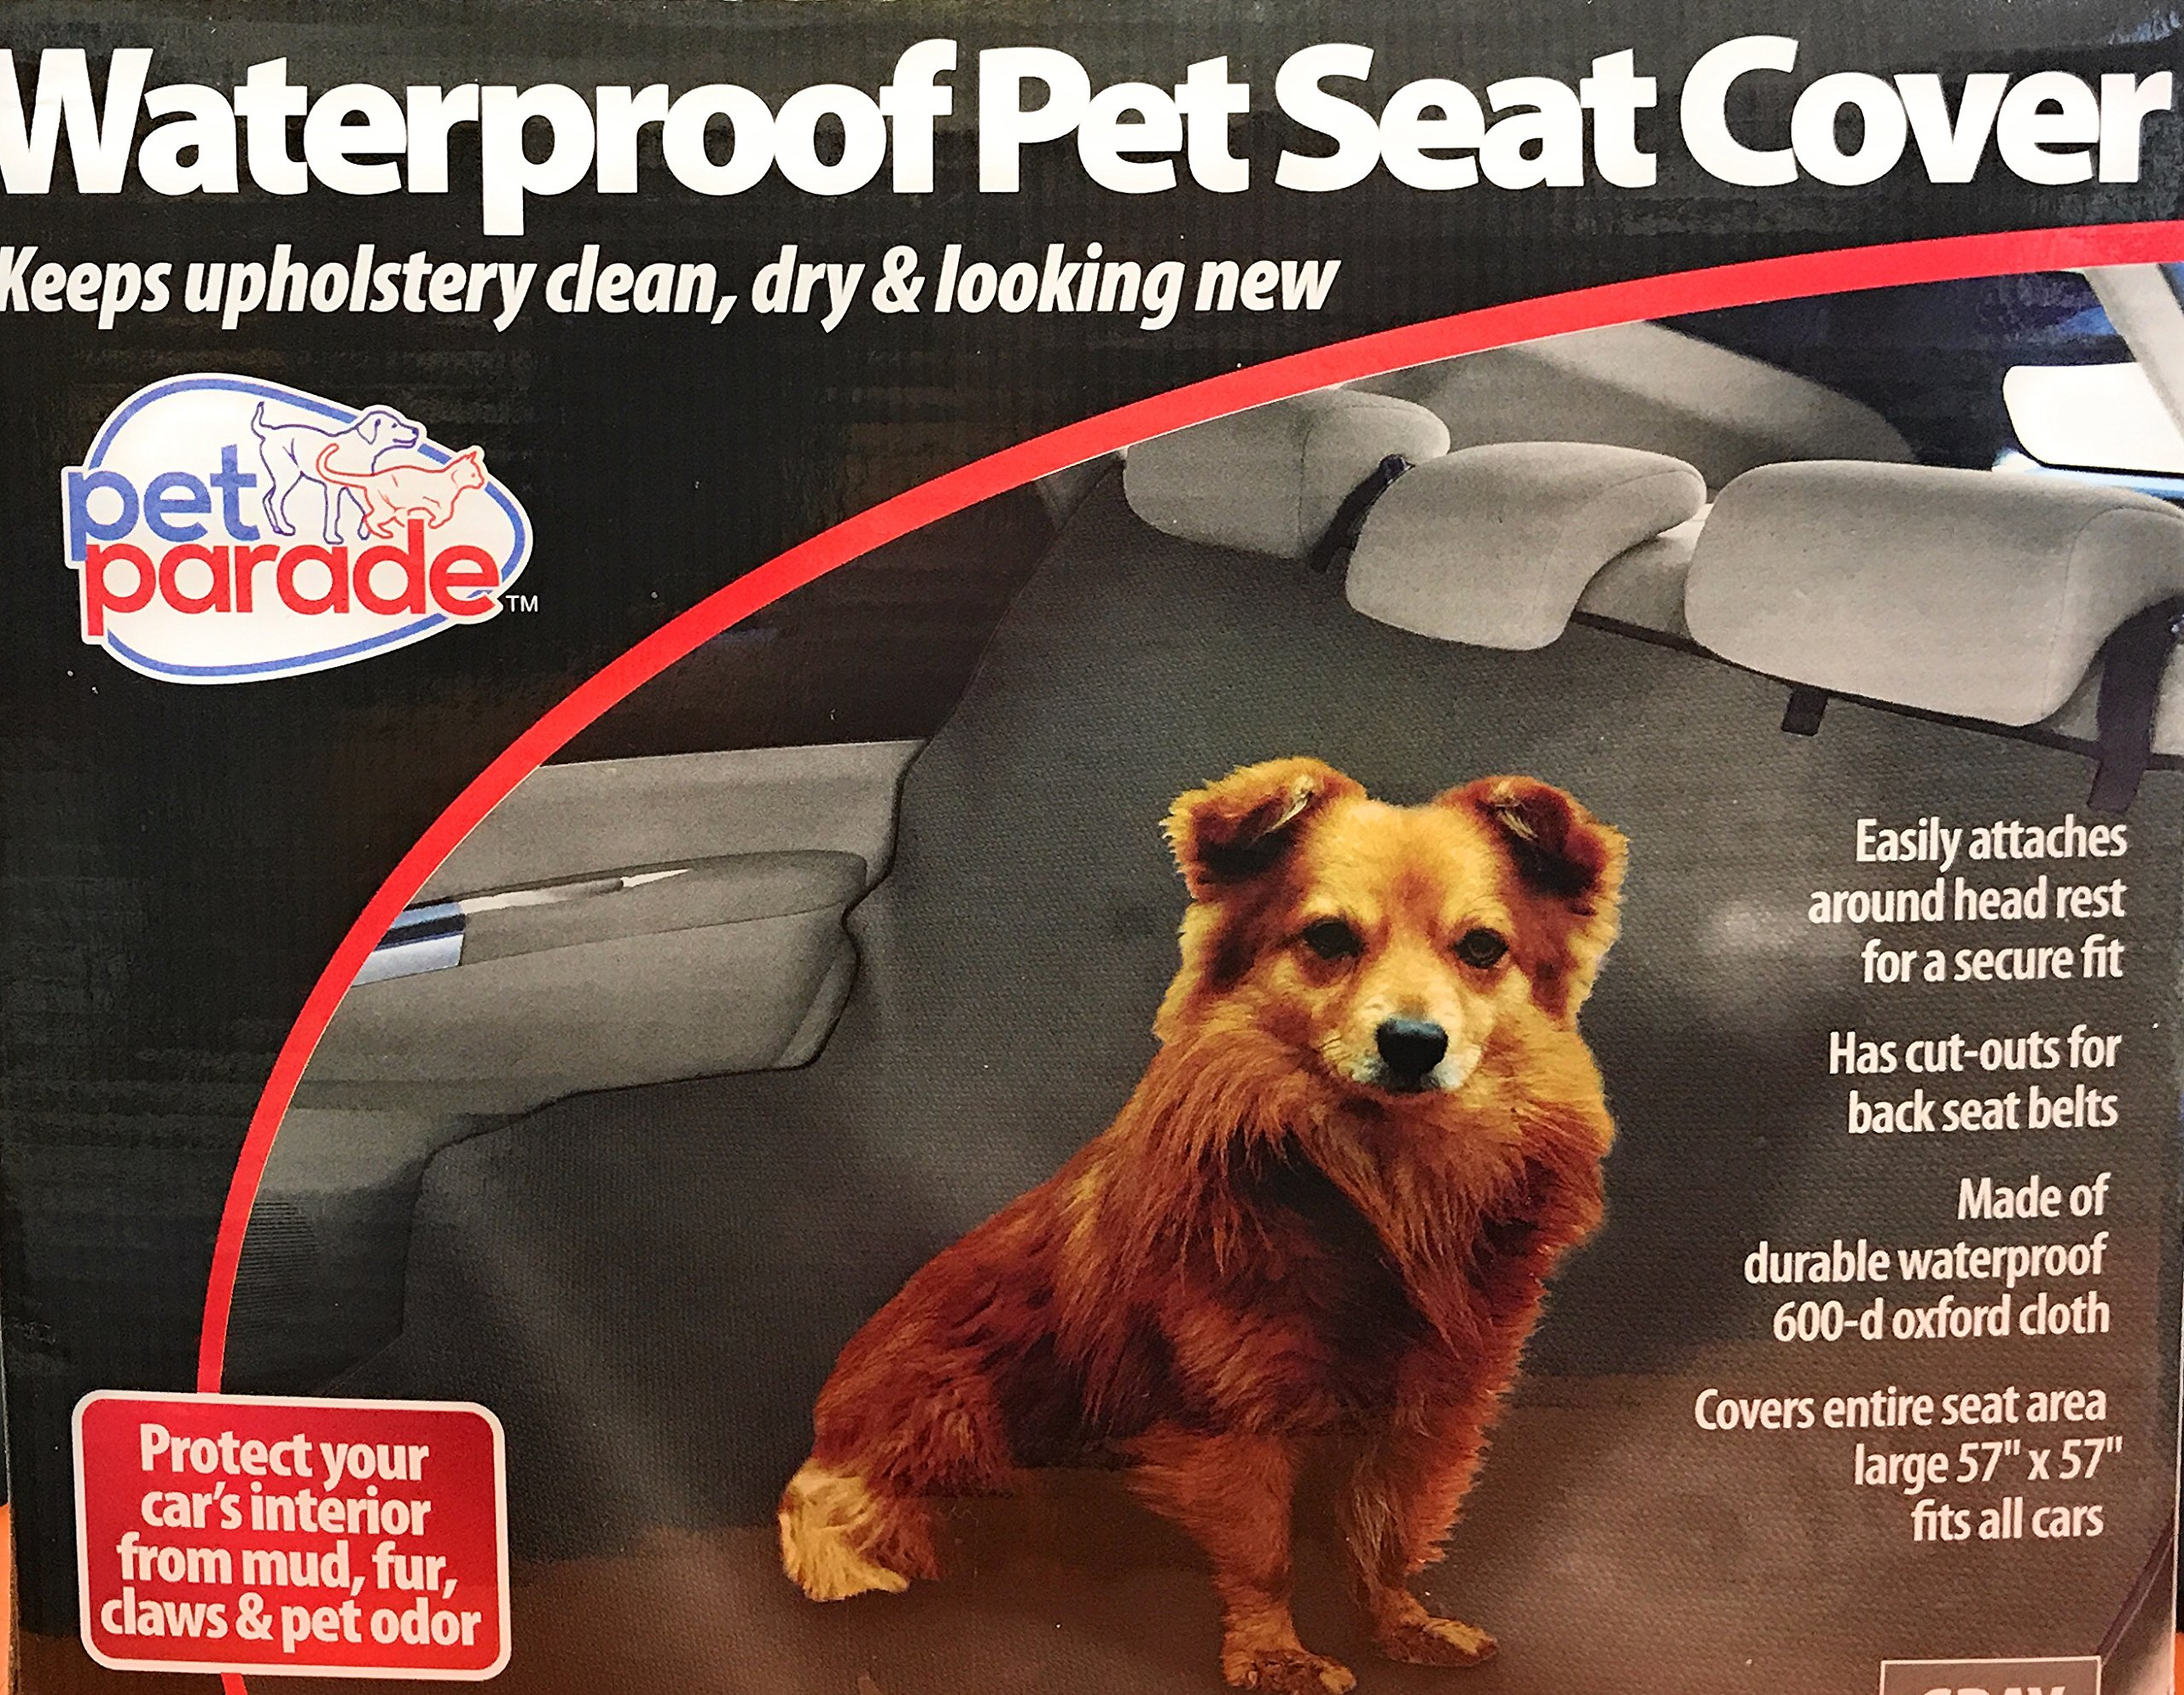 Pet Parade Waterproof Pet Seat cover, Gray